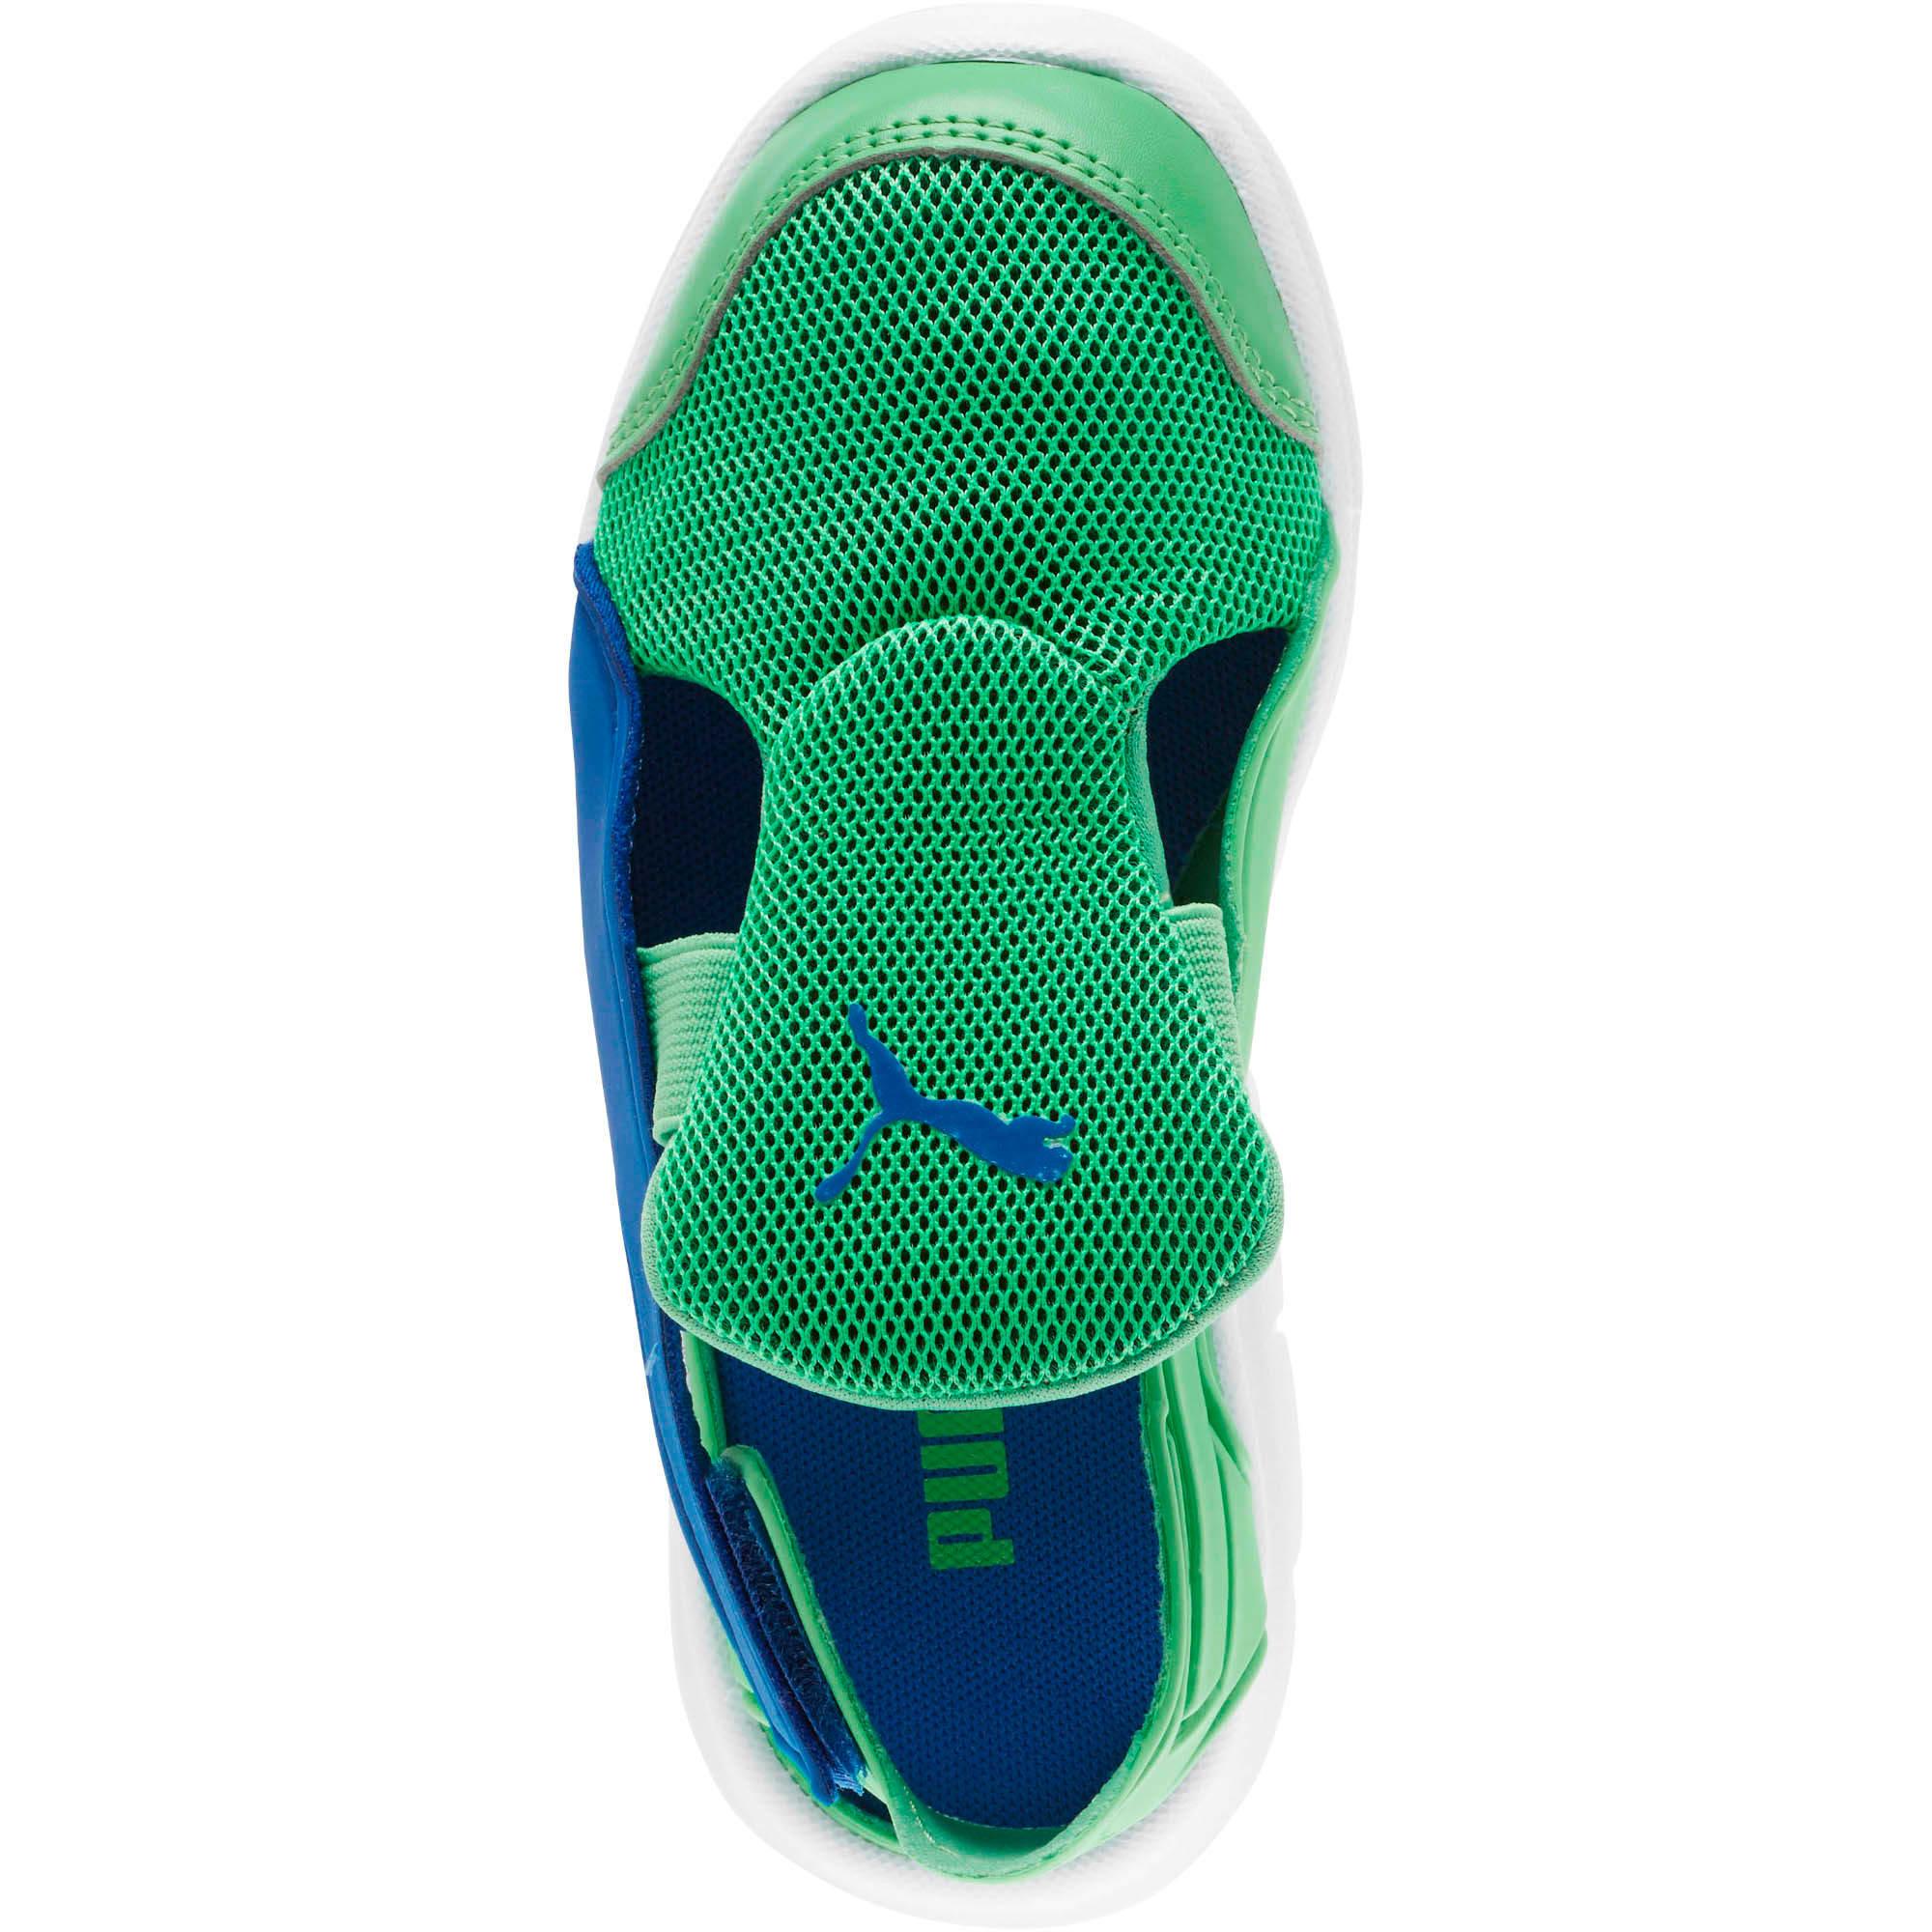 Thumbnail 5 of Bao 3 Open Little Kids' Shoes, Surf The Web-Irish Green, medium